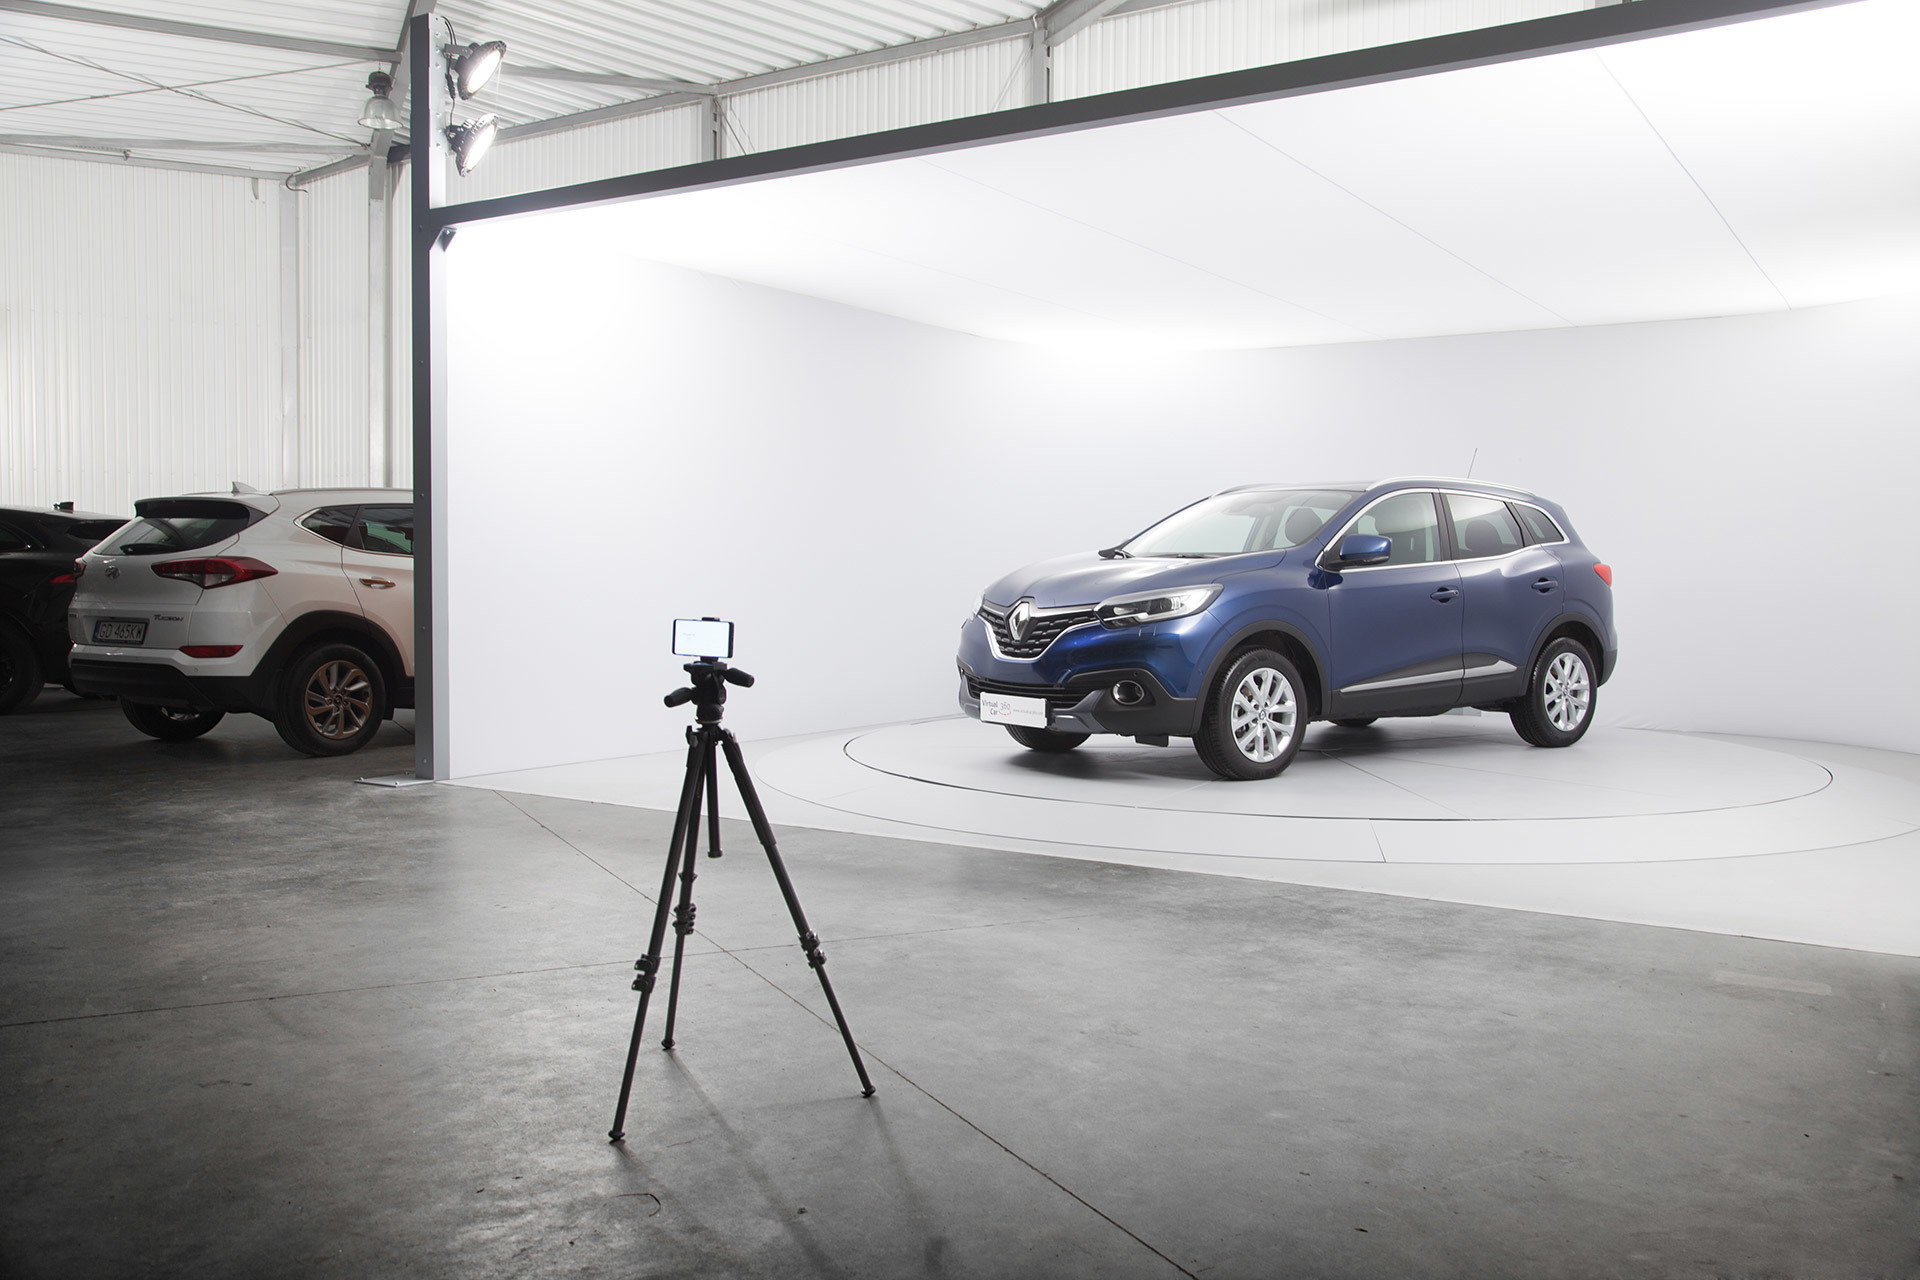 Virtual Car 360 - The Future of Online Car Sales